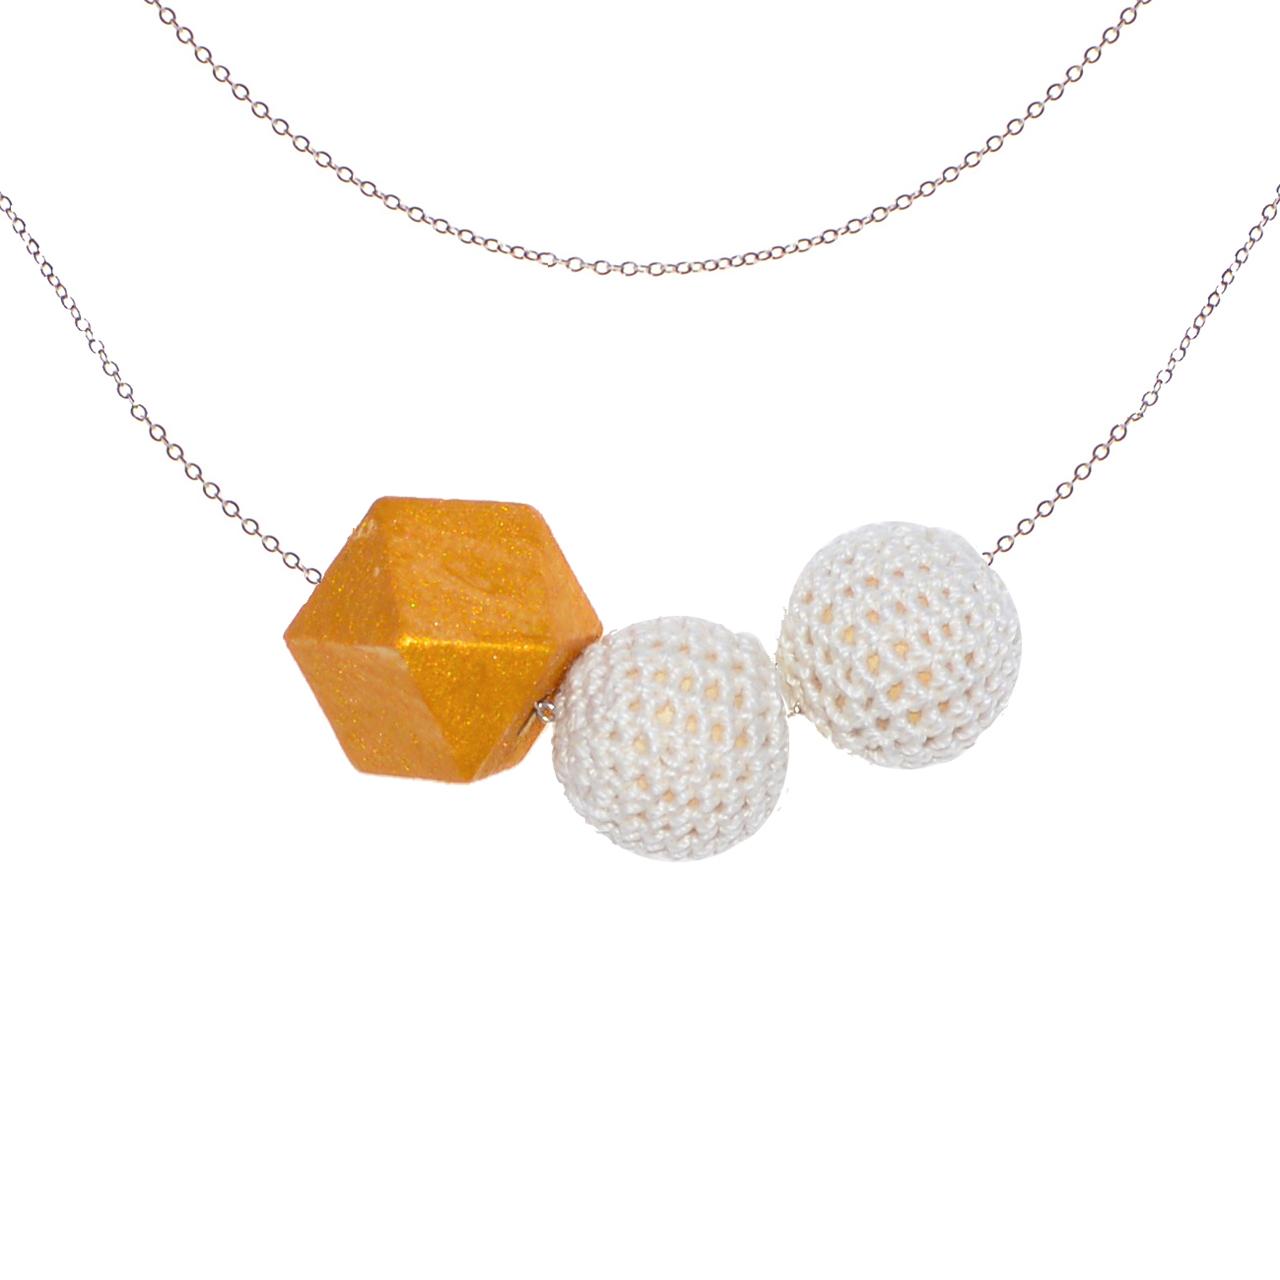 Mon Bijou - Necklace Night Out 3 white   The Design Gift Shop